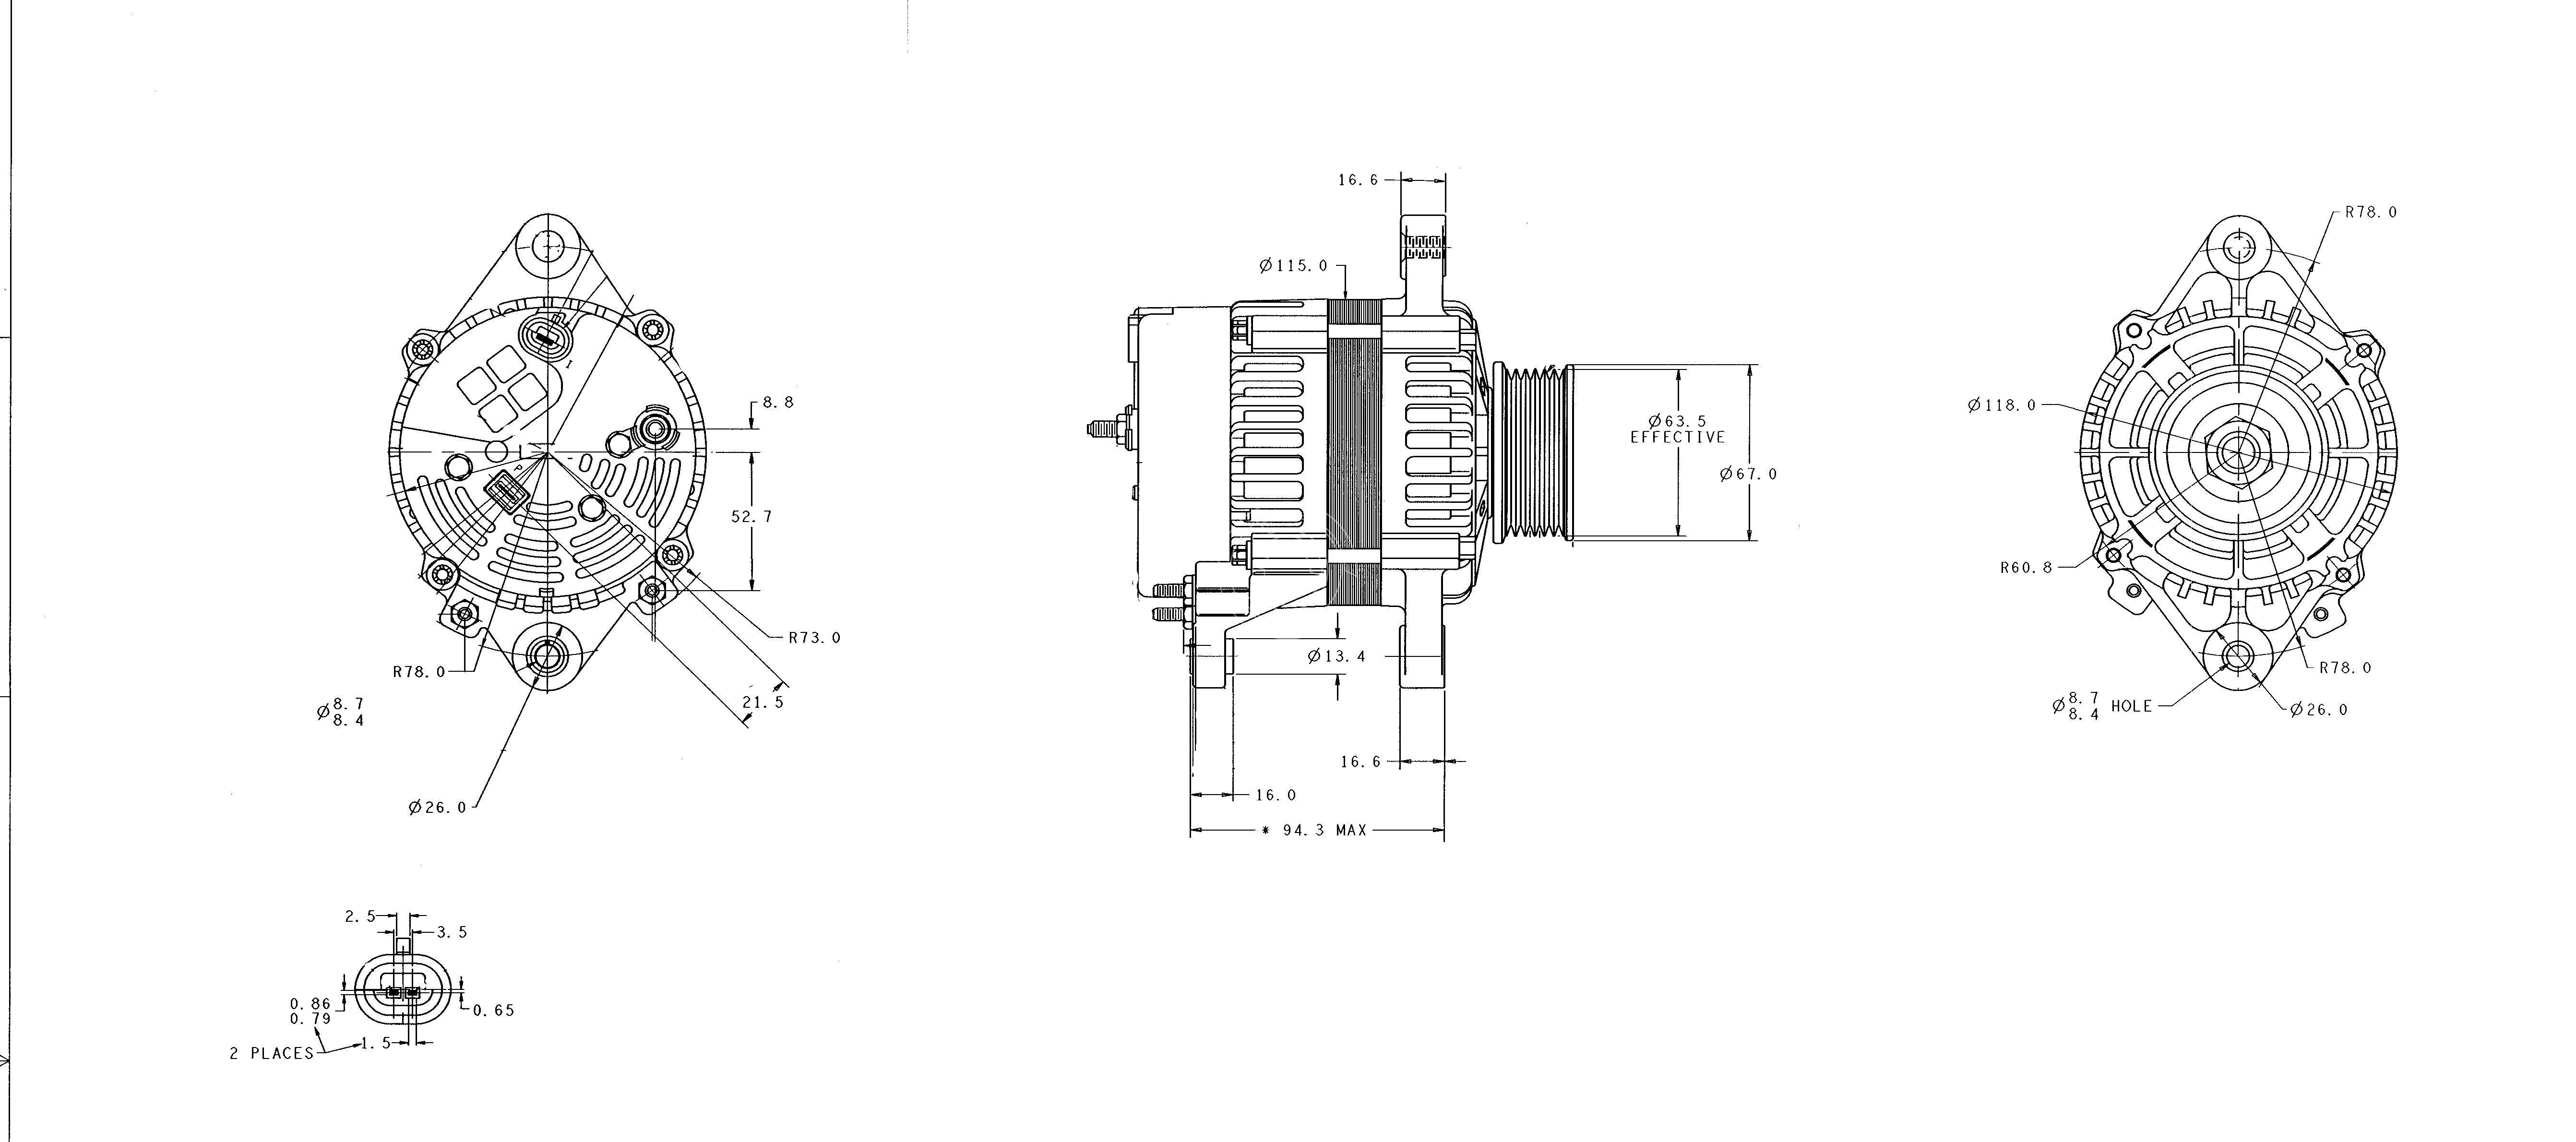 alternator delco-remy 19020609 alternator delco-remy 19020609